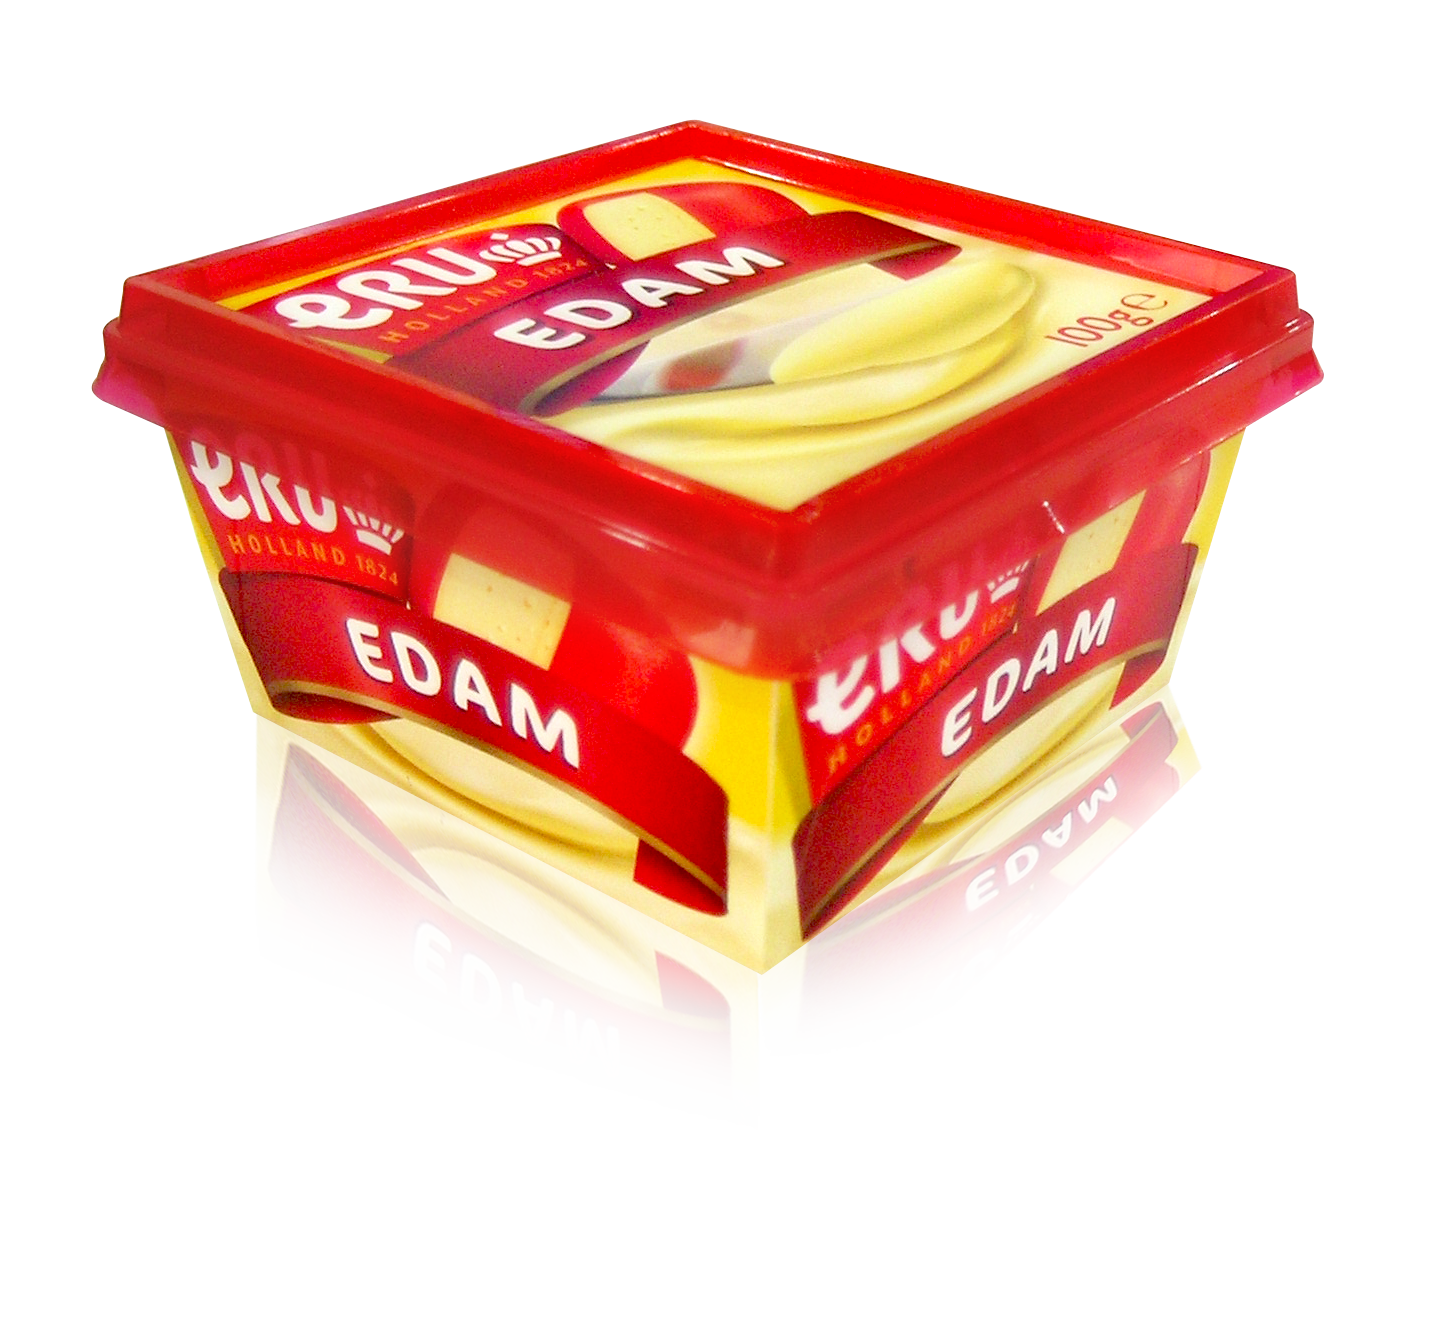 Premium Cheese image